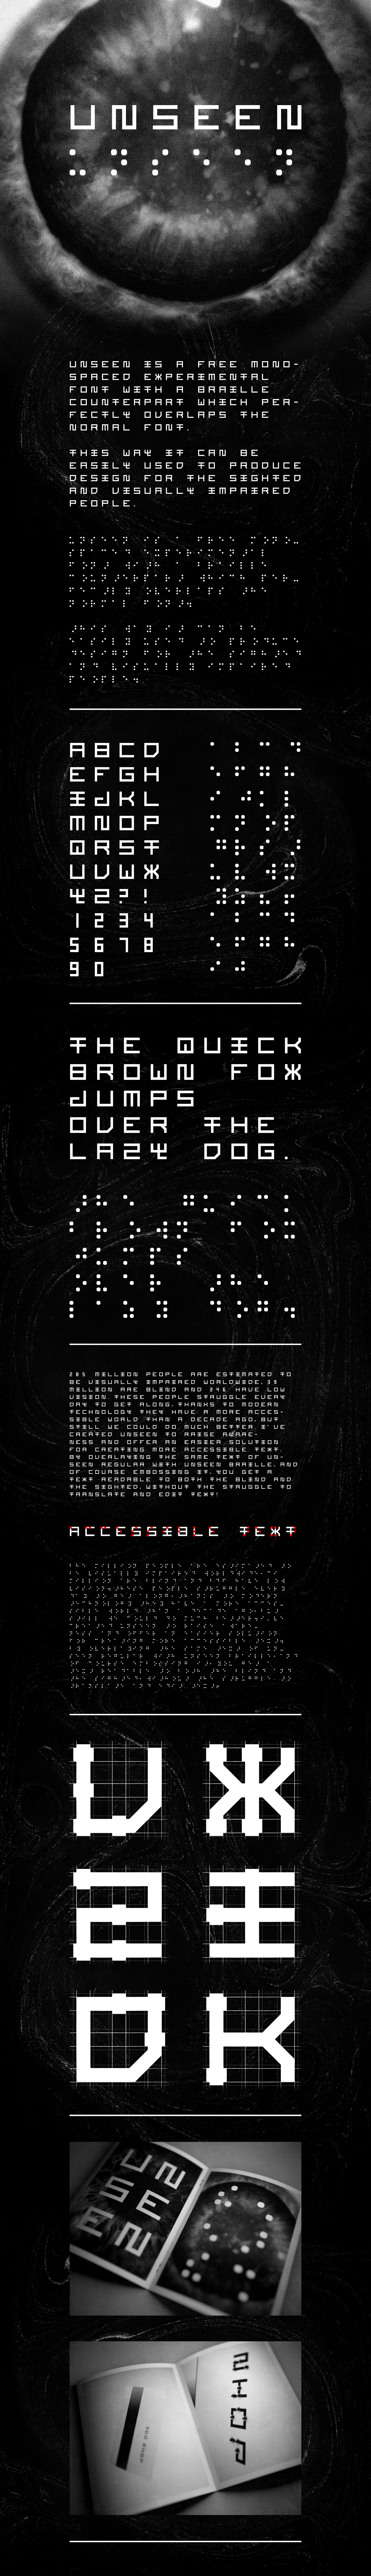 font free Braille blind monospace square minimal modern freebie Typeface typo bauhaus experimental accessible download